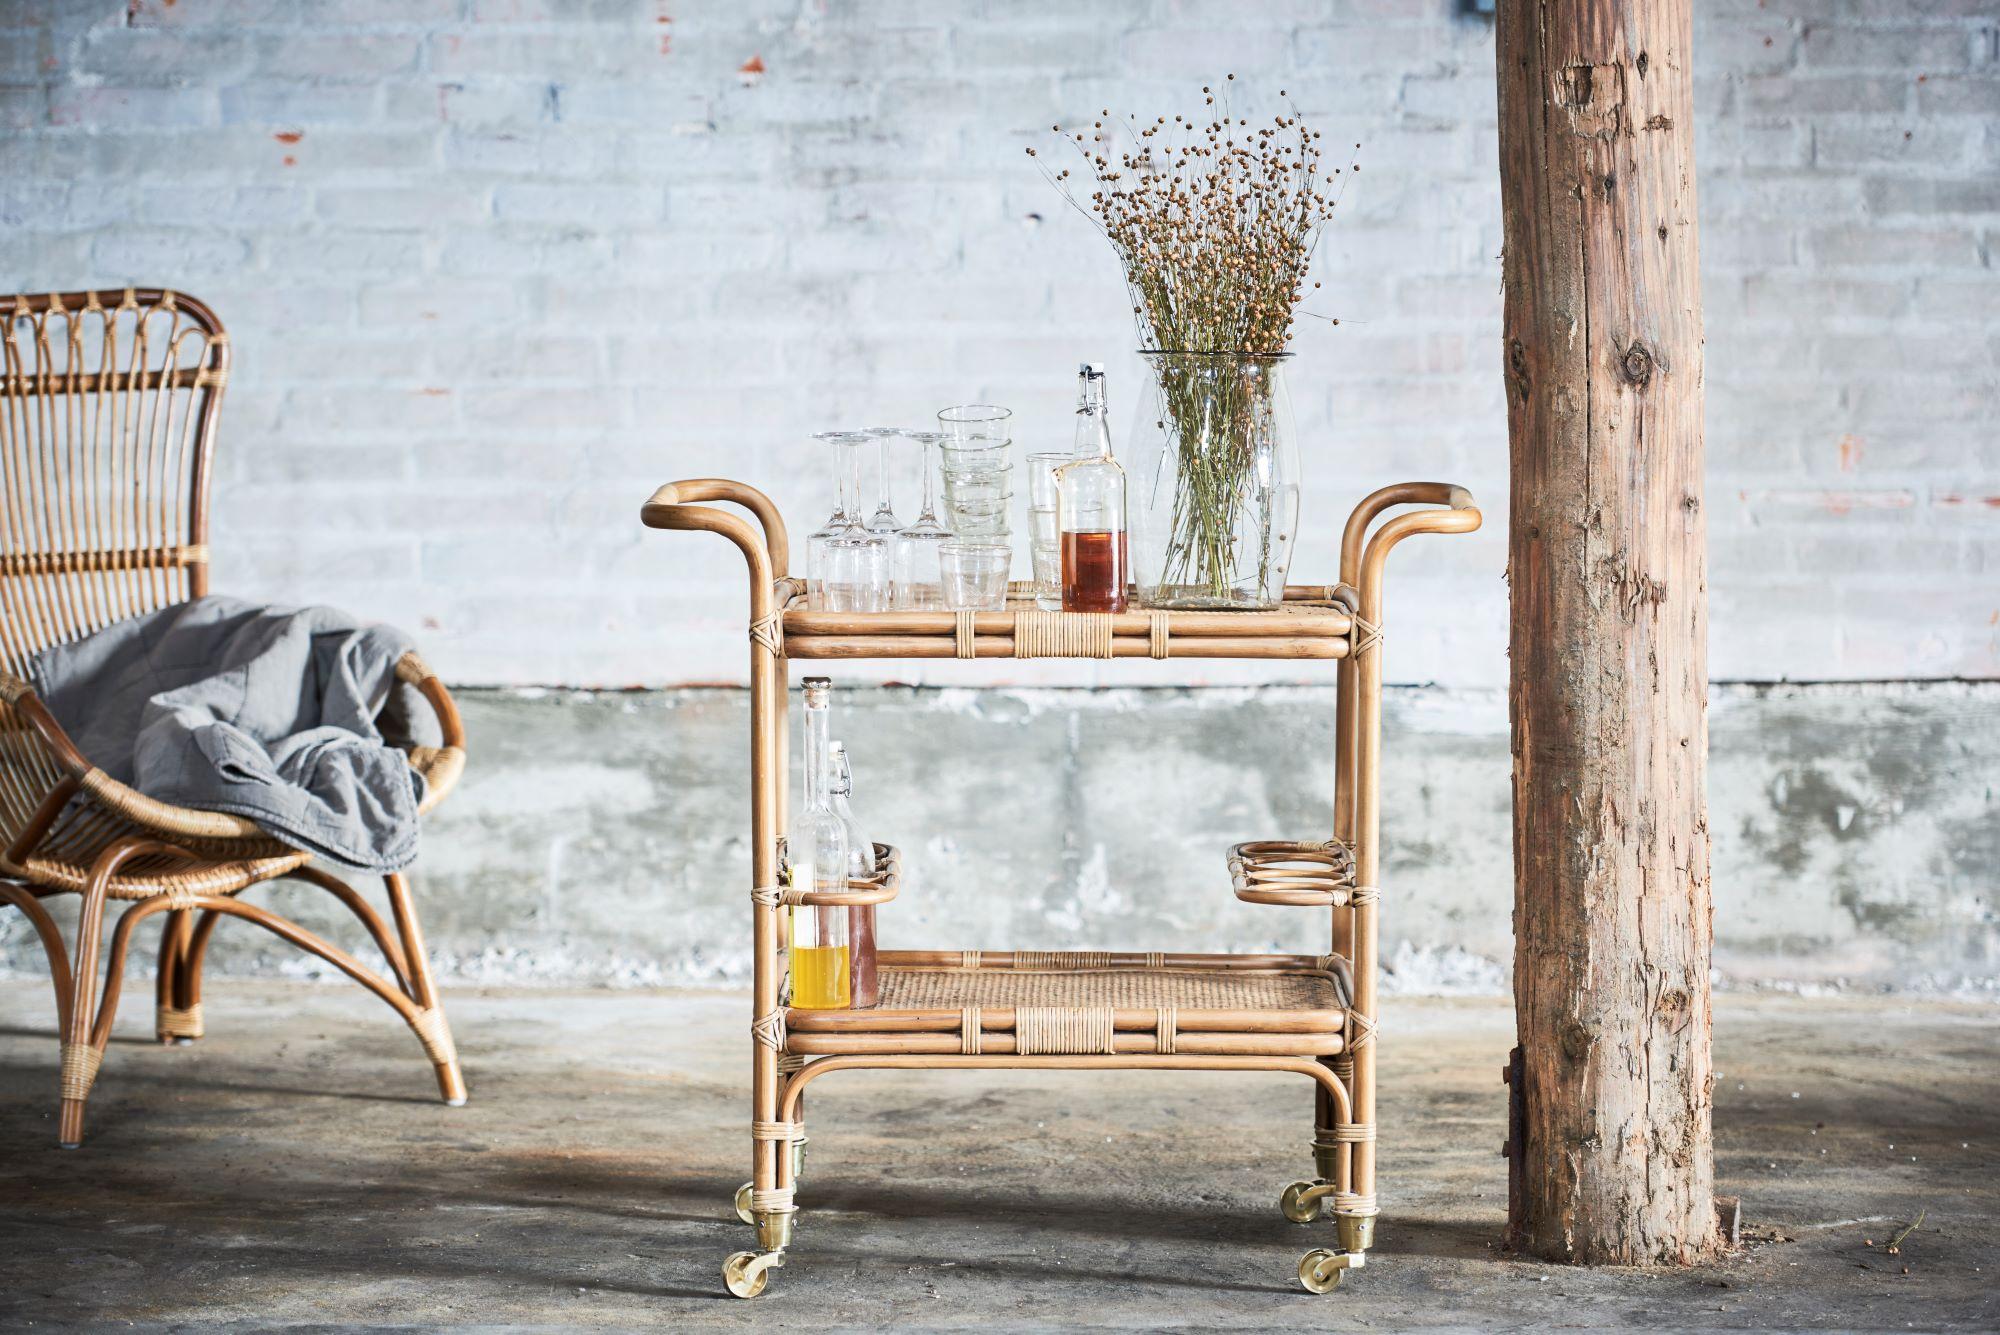 carlo-bar-cart-sika-design-4027a-.jpg